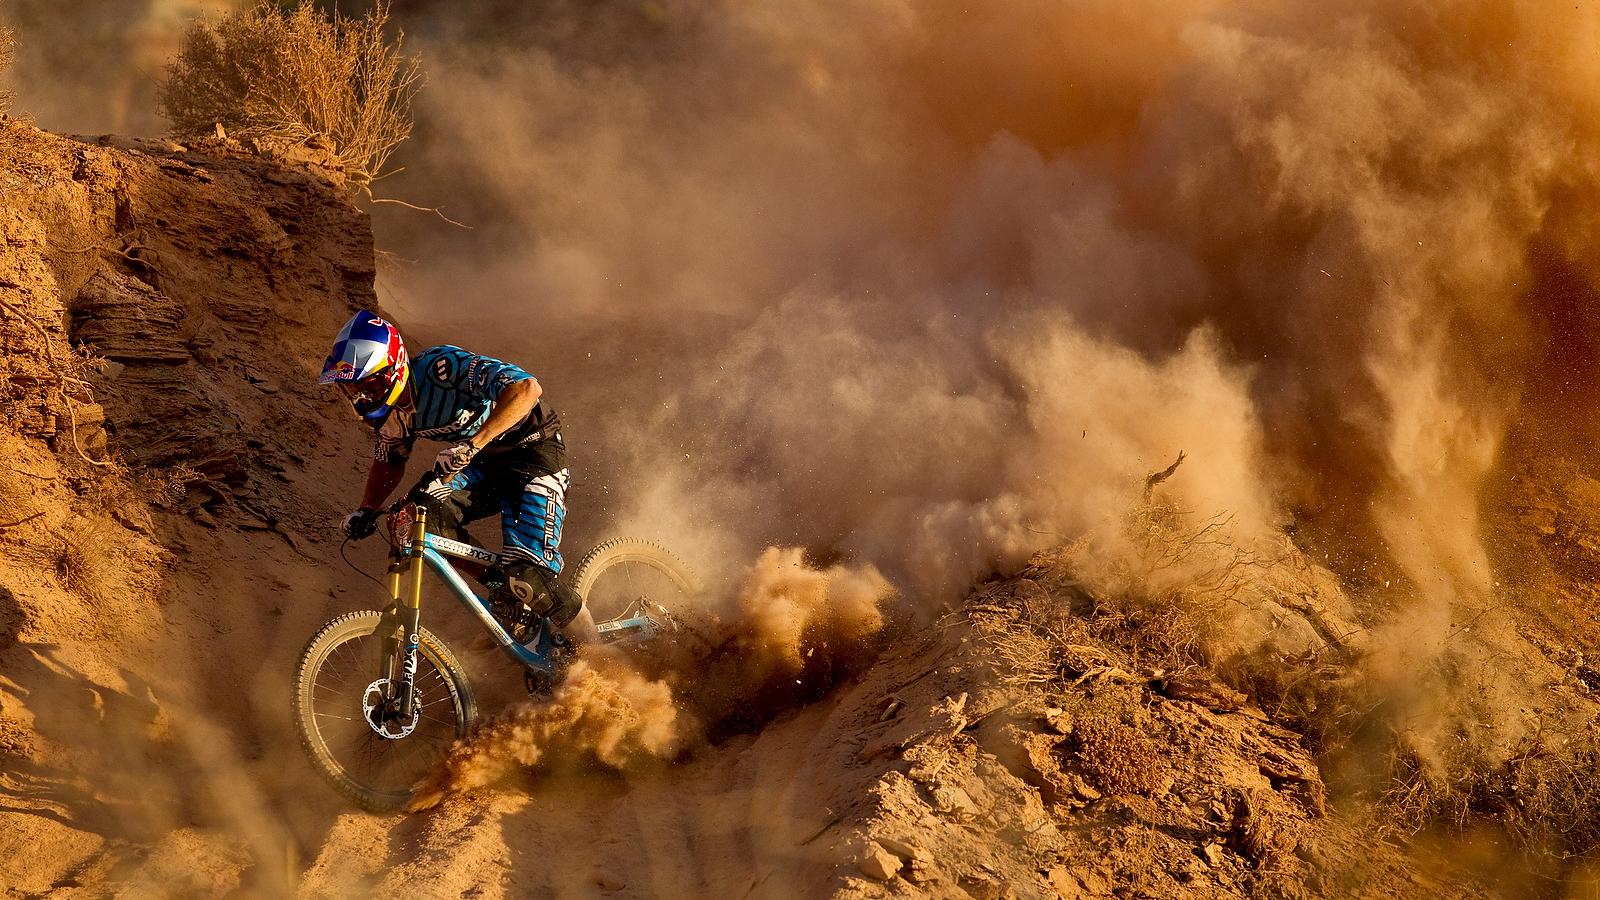 mountain bike bicycle dust dirt red bull racing track wallpaper